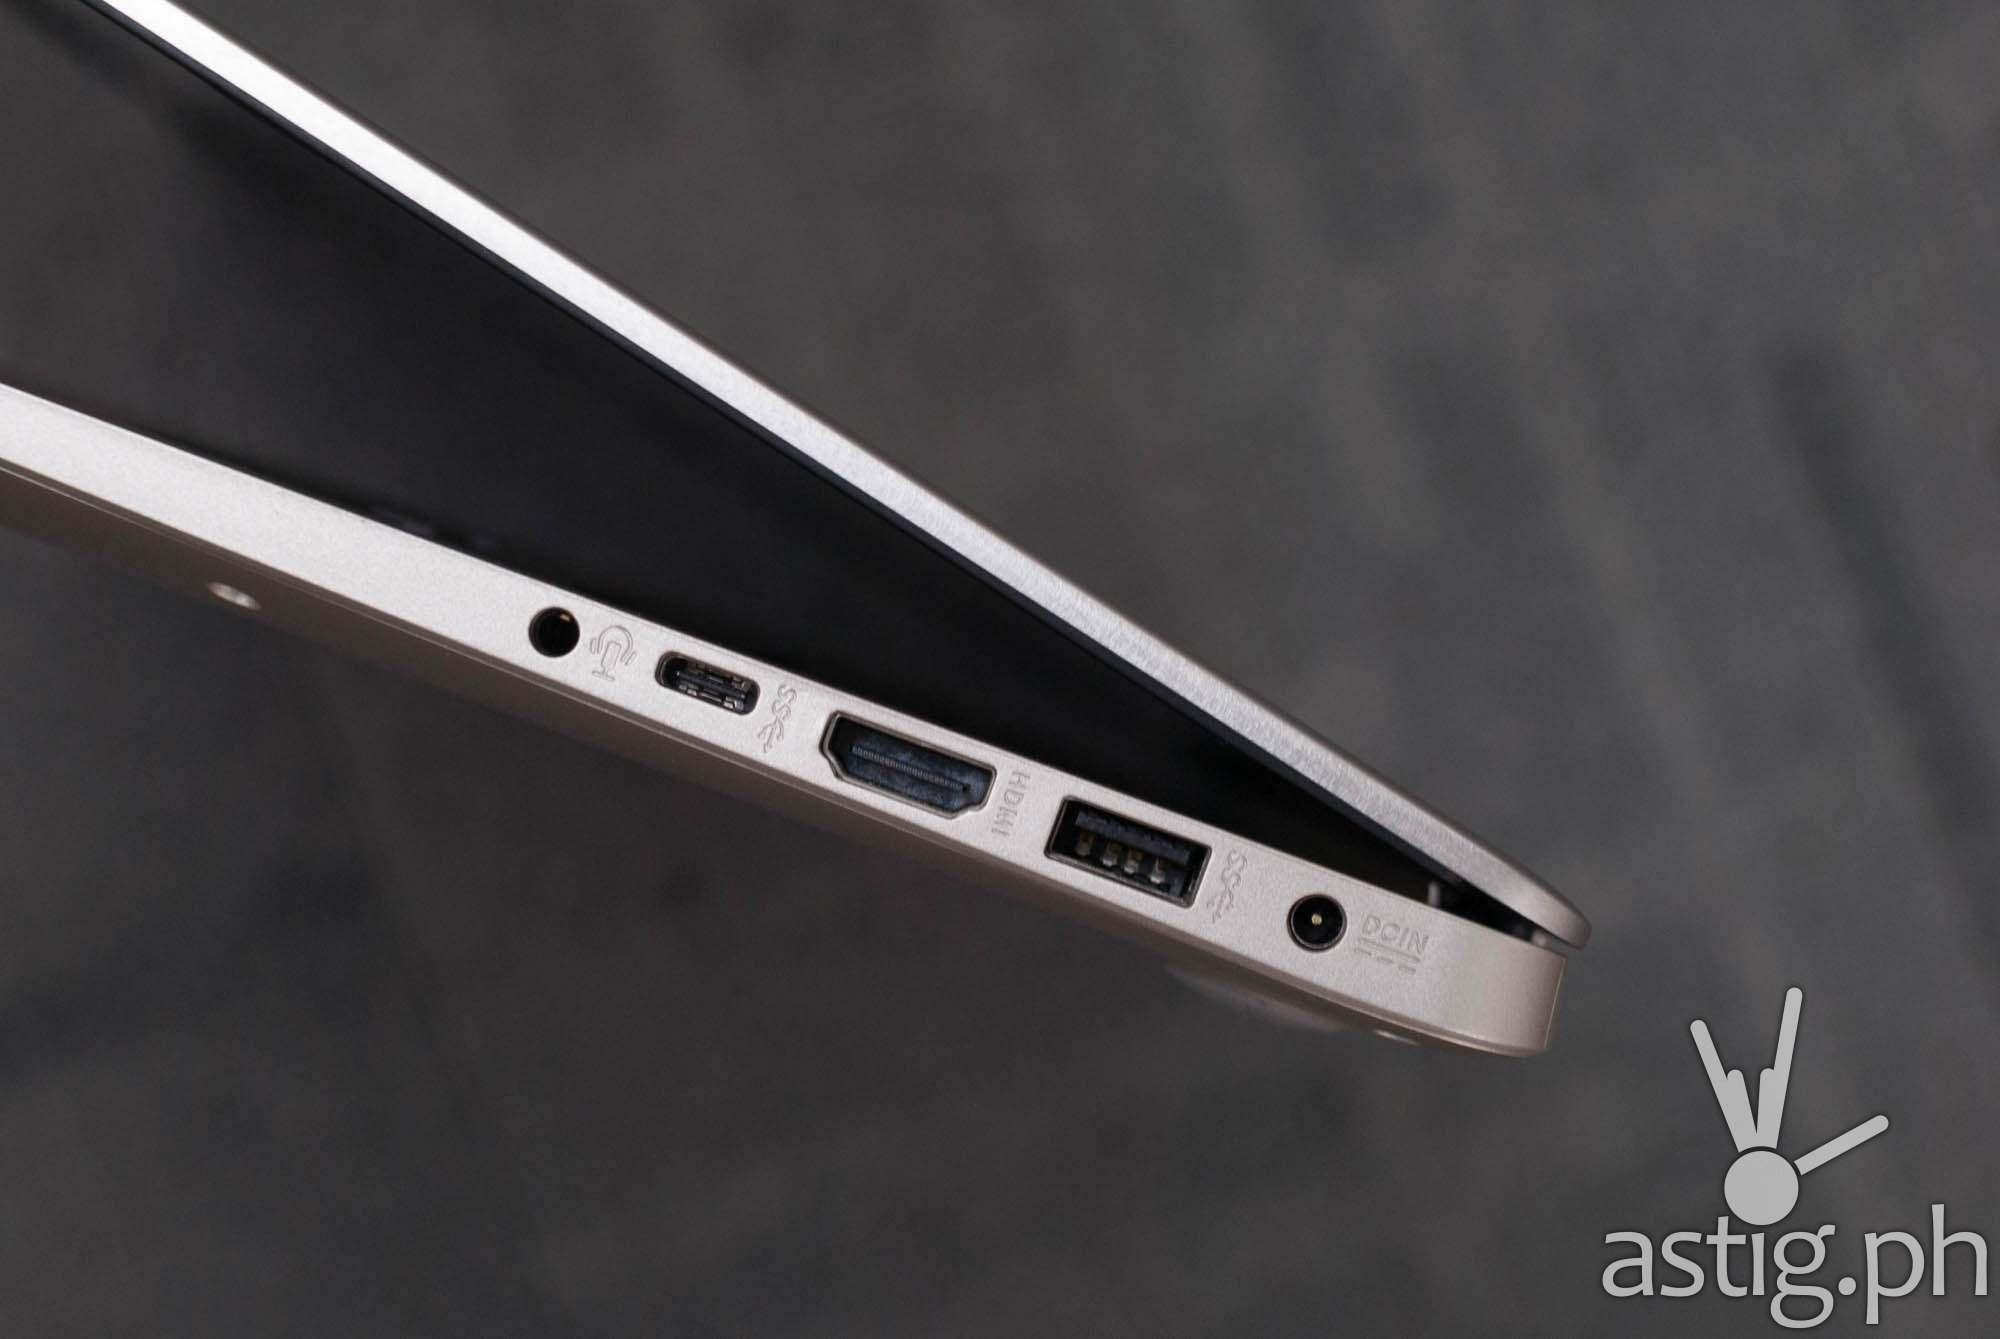 3.5mm port, USB type-C port, HDMI port,, USB type-A port, and power port - ASUS VivoBook S15